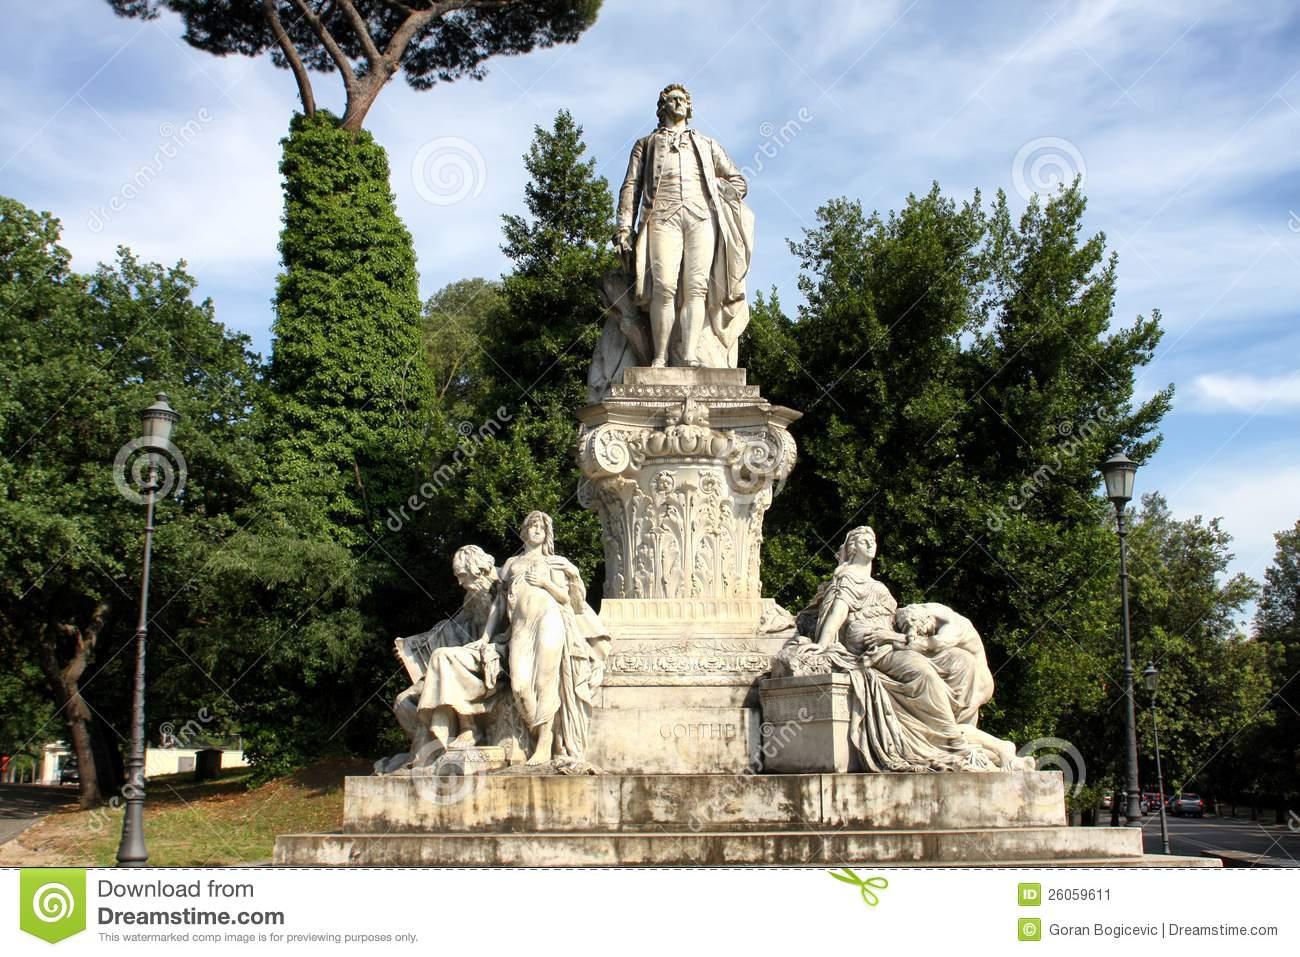 Goethe Statue At Villa Borghese In Rome Stock Photo.